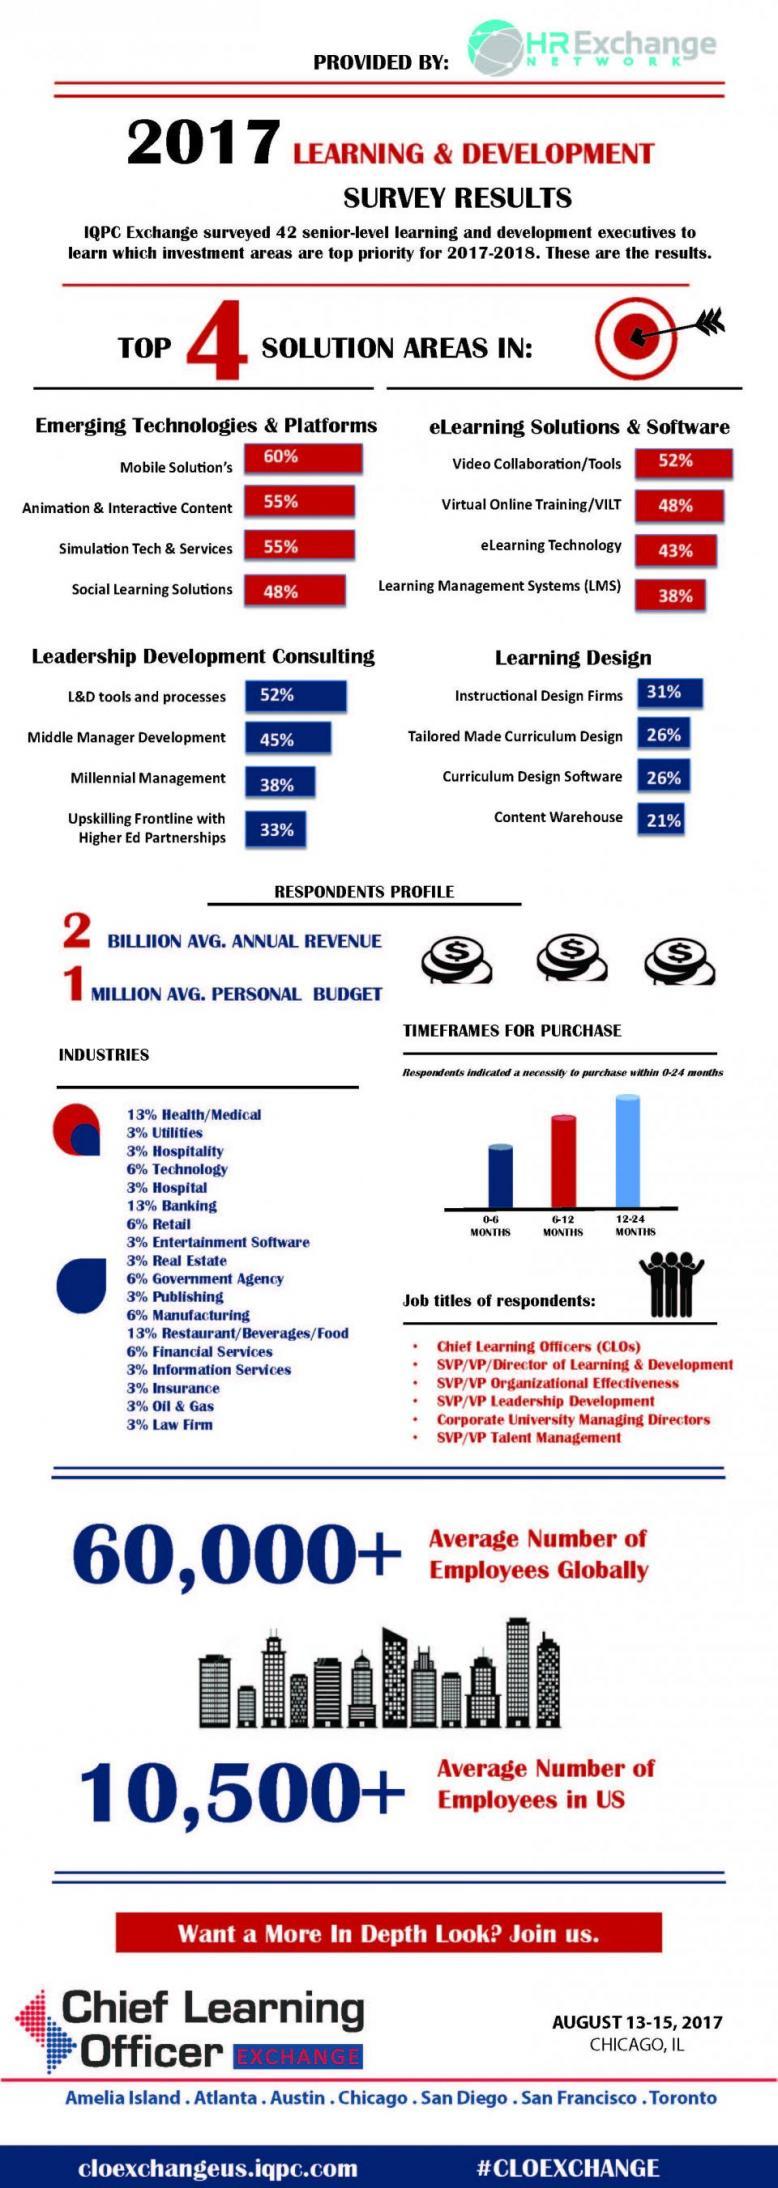 HREN_CLO Infographic1